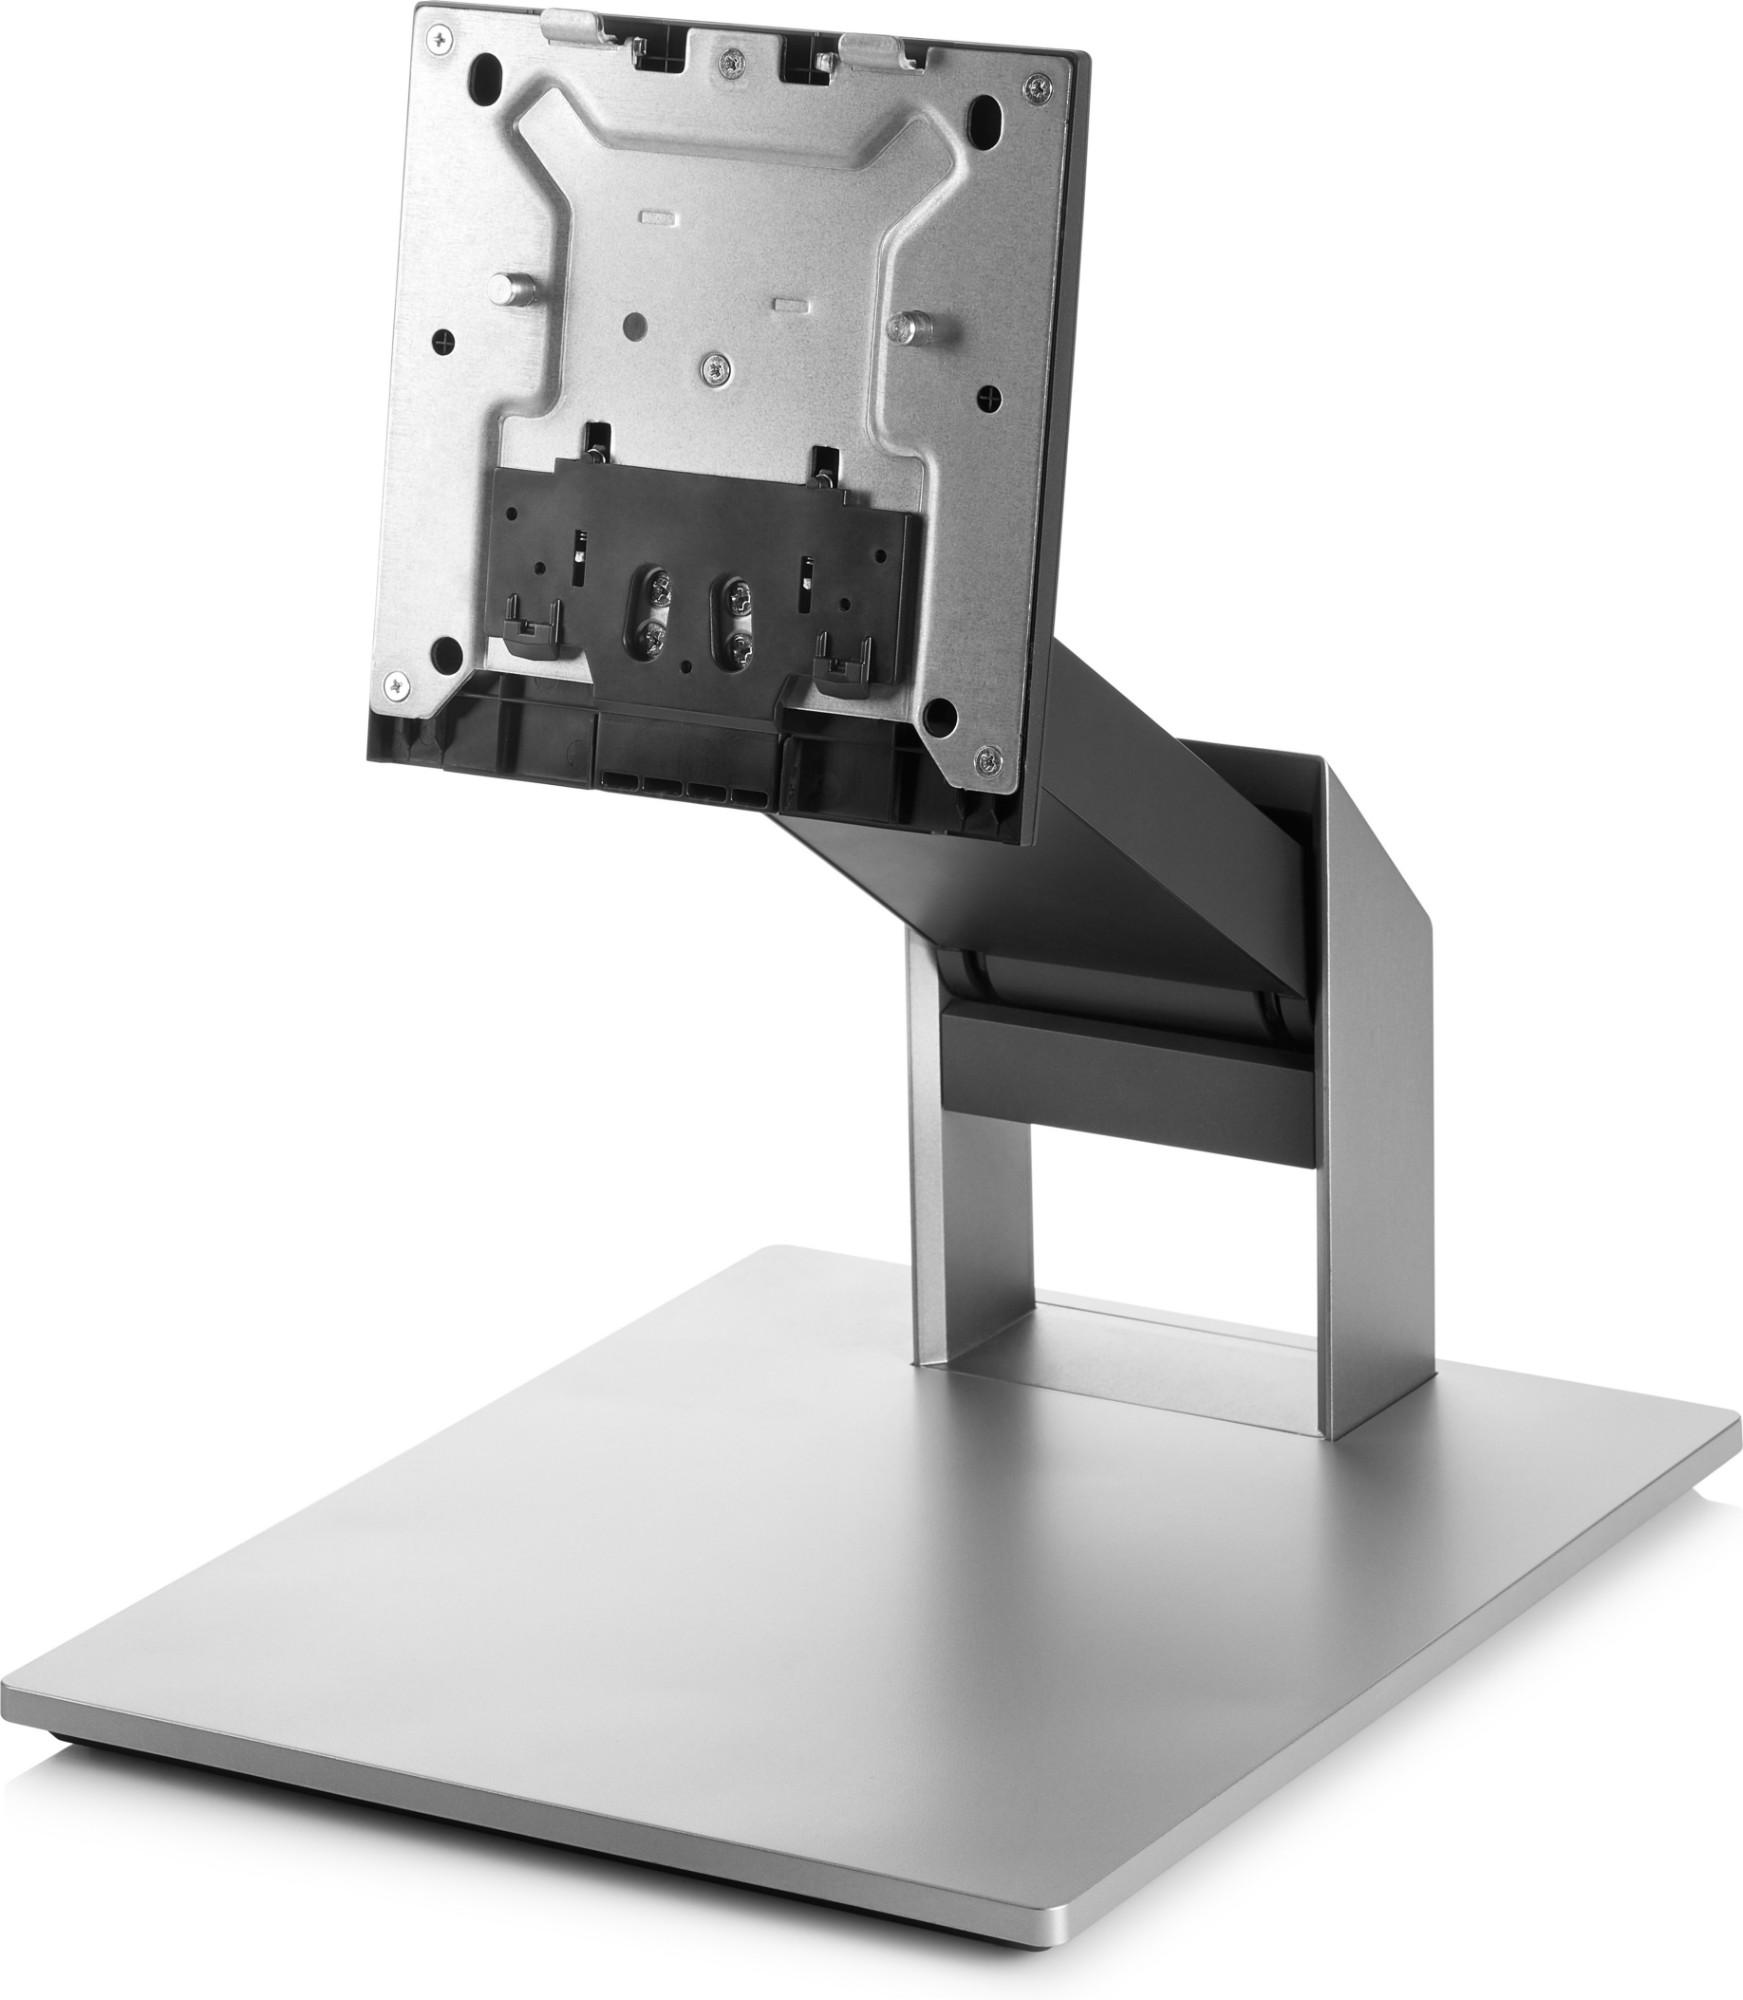 HP EliteOne G3 800 AIO Recline Stand